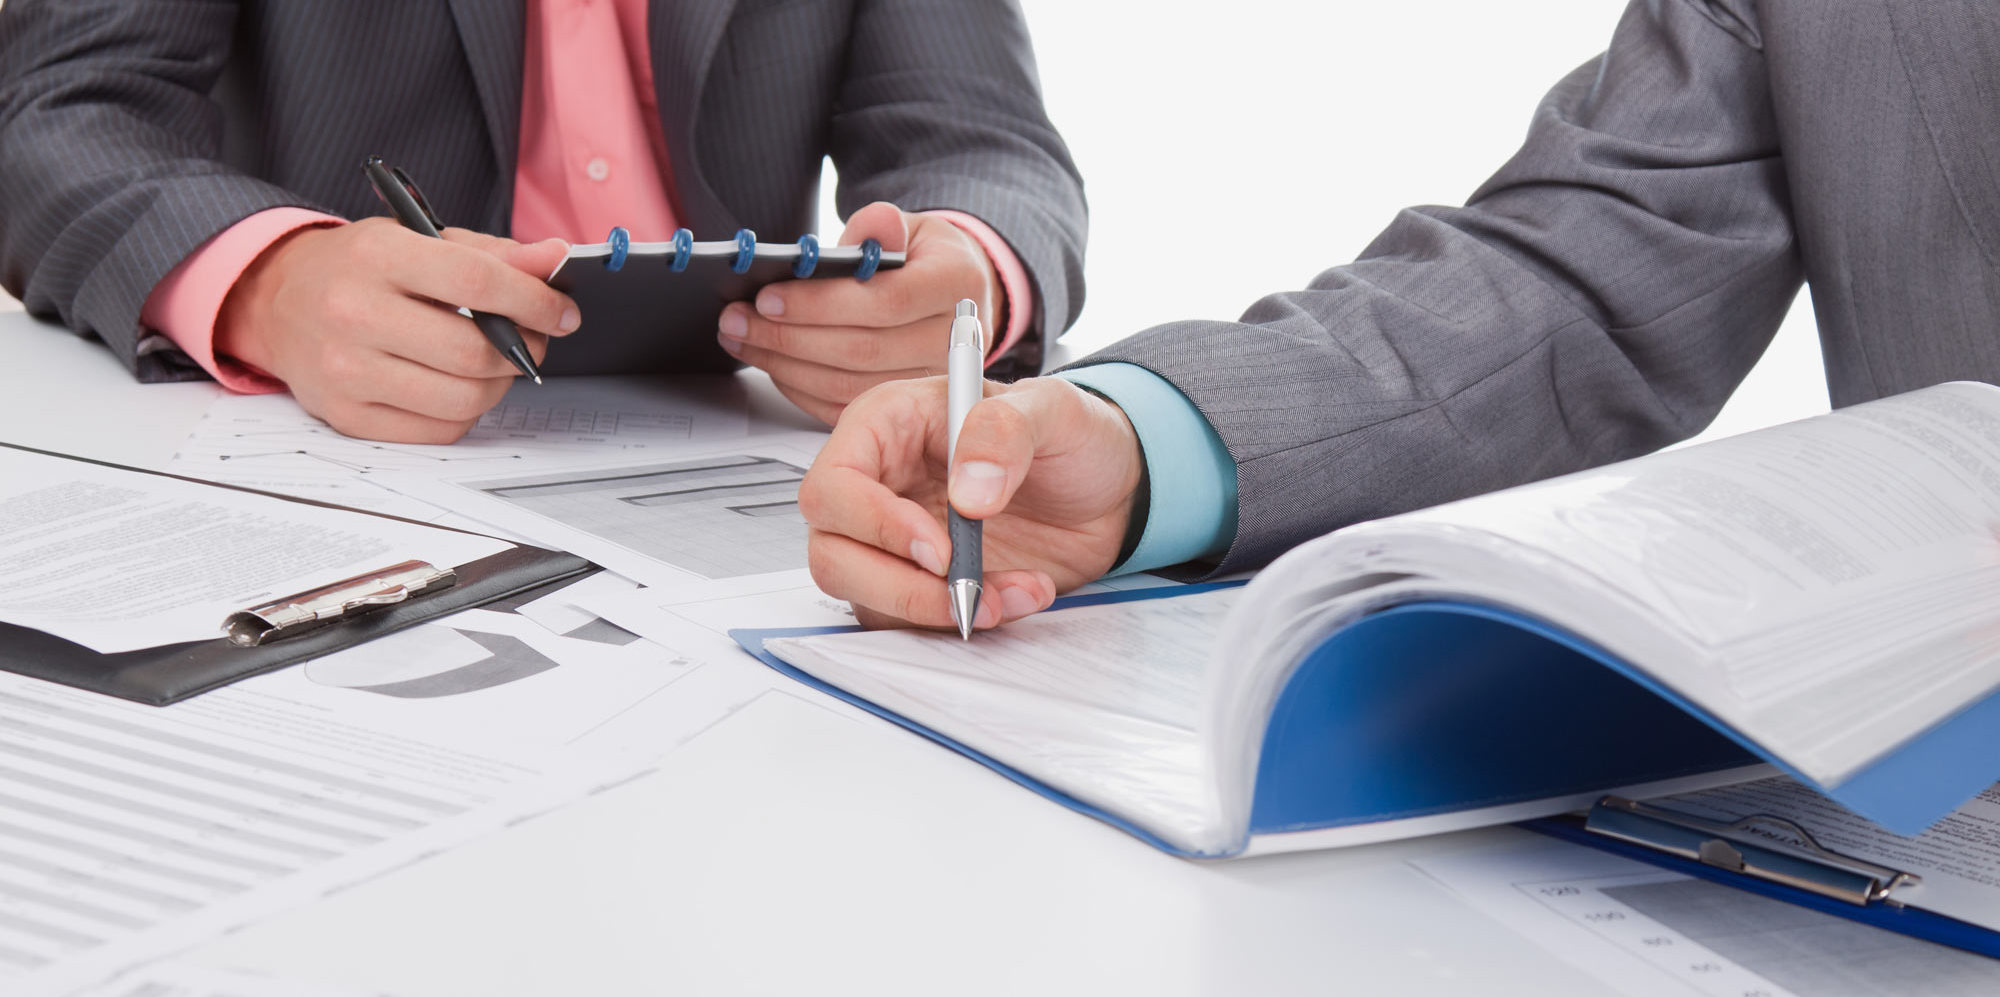 Cost effective legal document preparation in Kingman, AZ